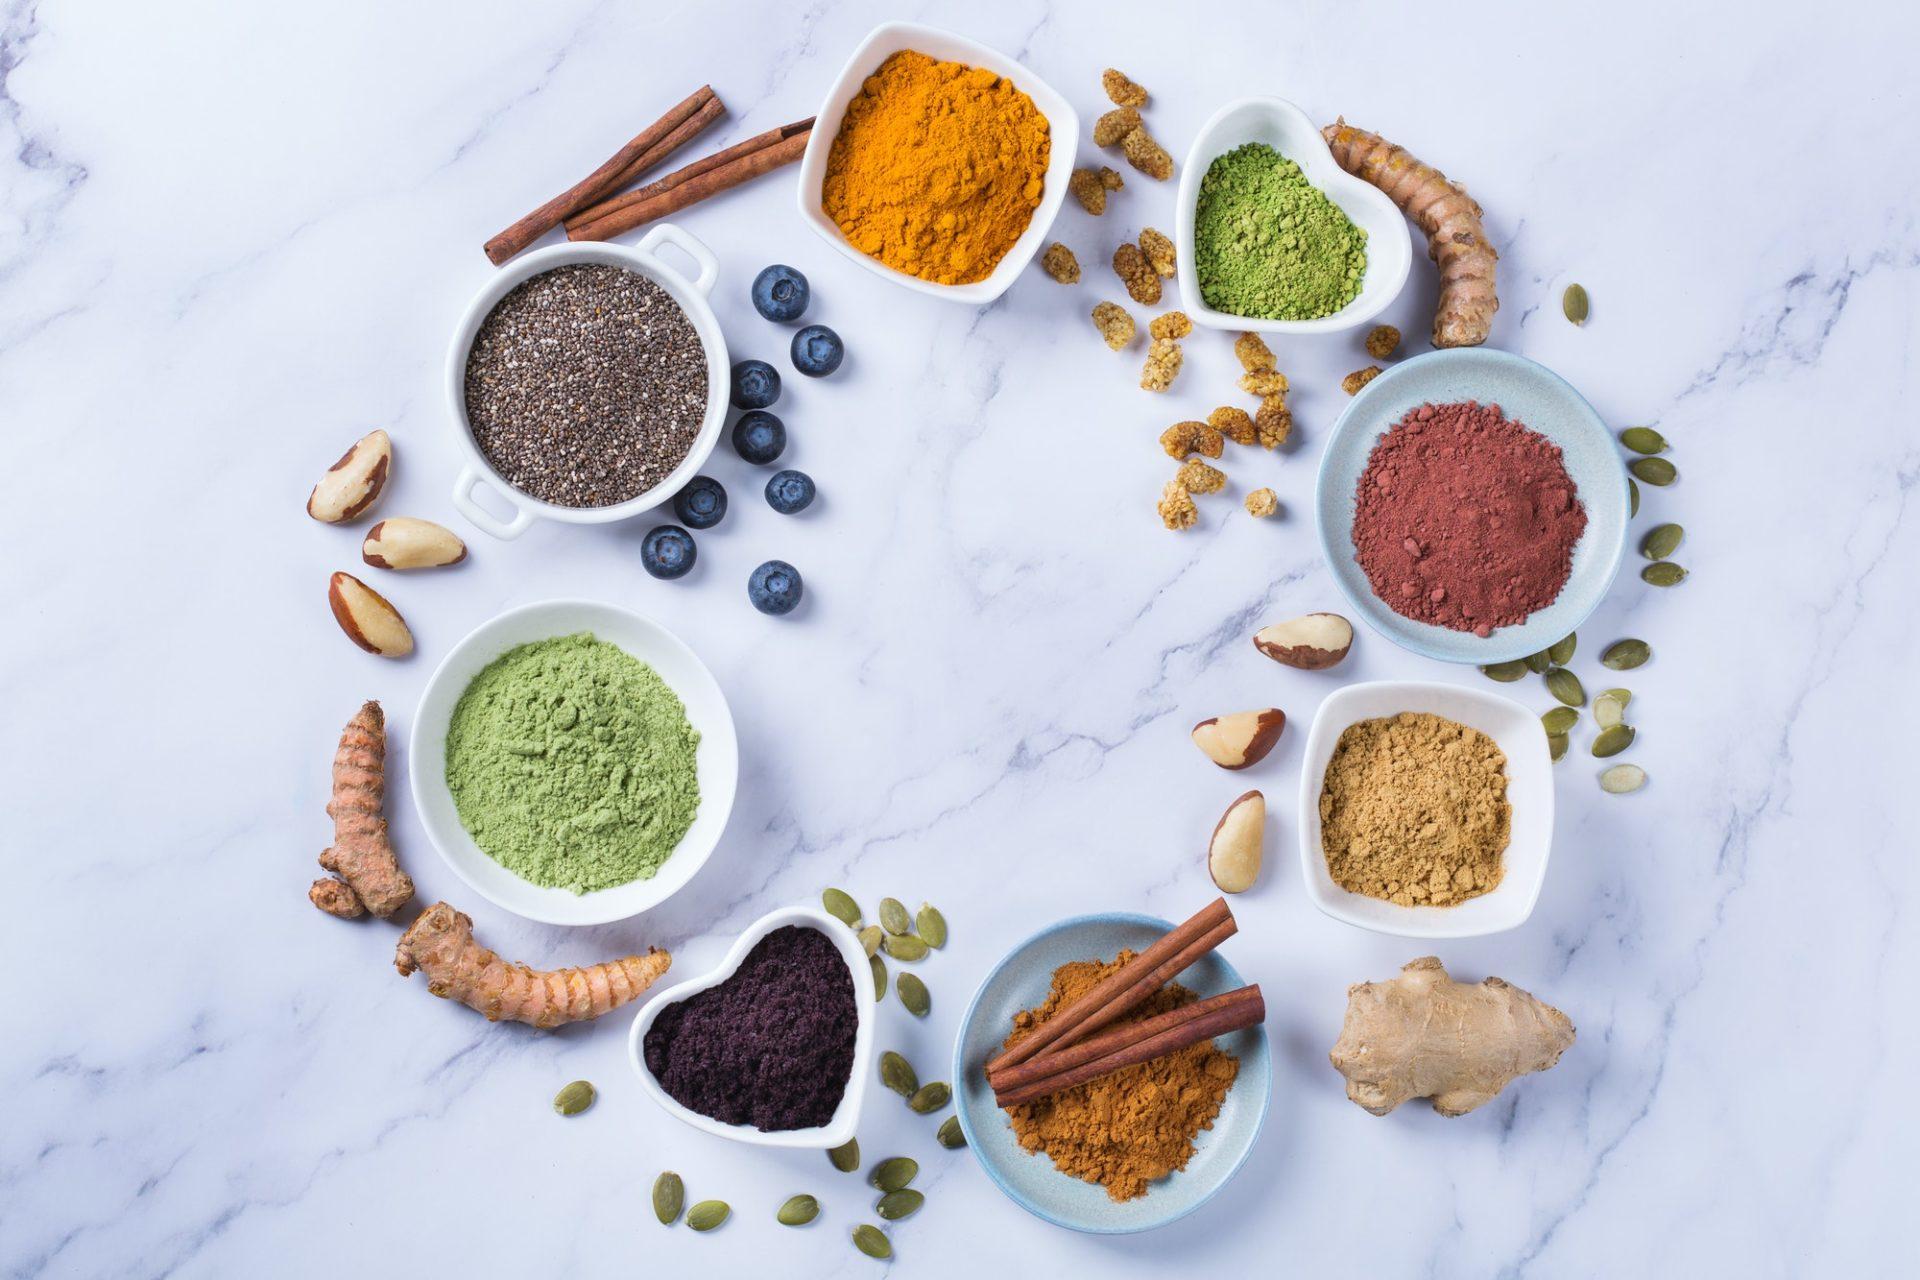 Assortment of superfood powder, acai, turmeric, ginger, matcha, cinnamon, wheat